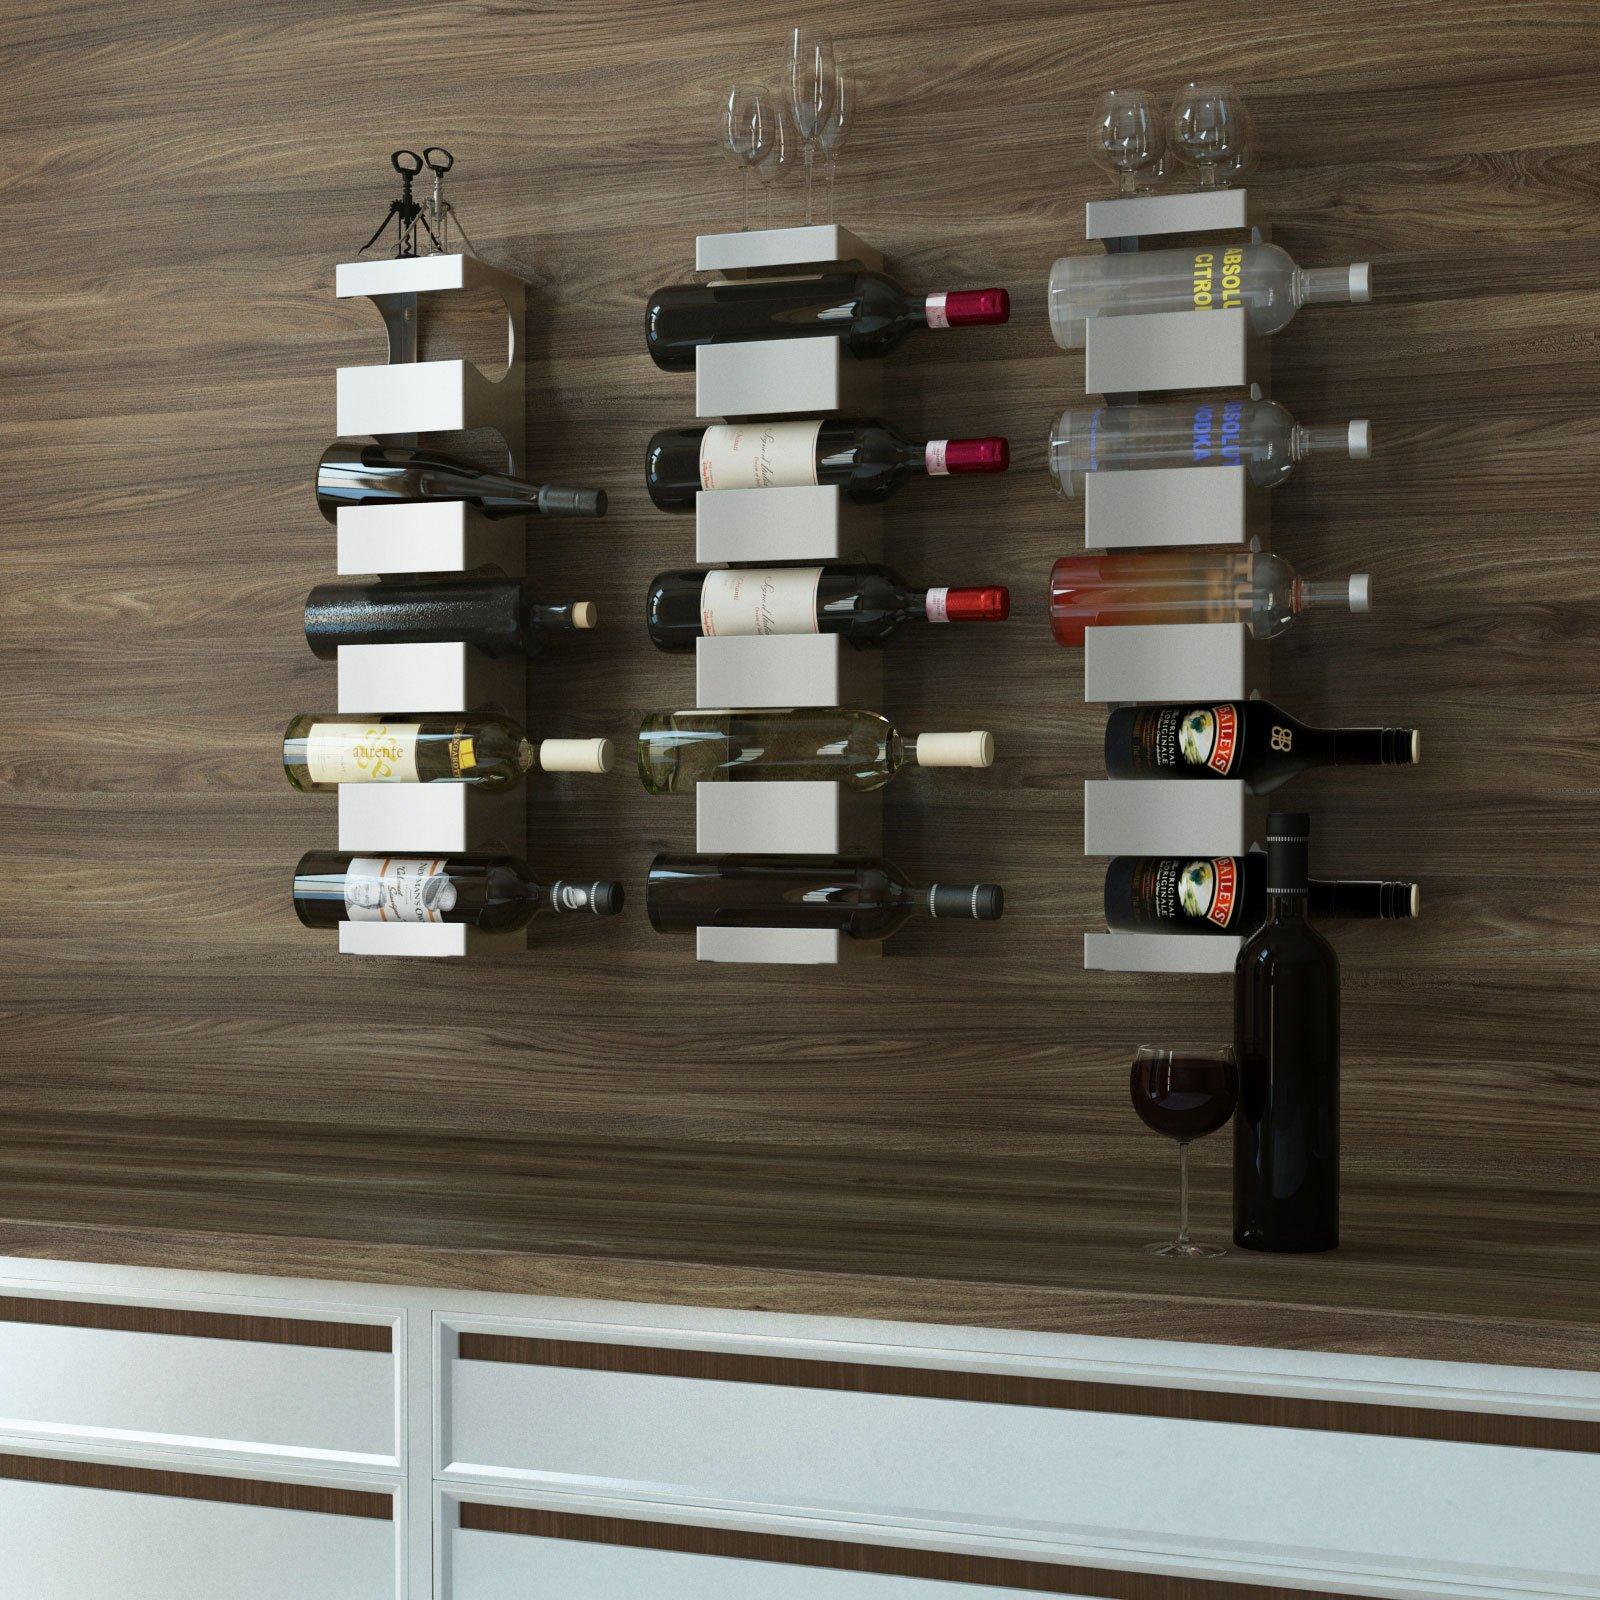 Set of 3 Stainless Steel Wine Rack - Wide Multi Bottle Holder with Top Shelf Section - Modern Art Design - Wall Mount (Holds 15 Bottles)